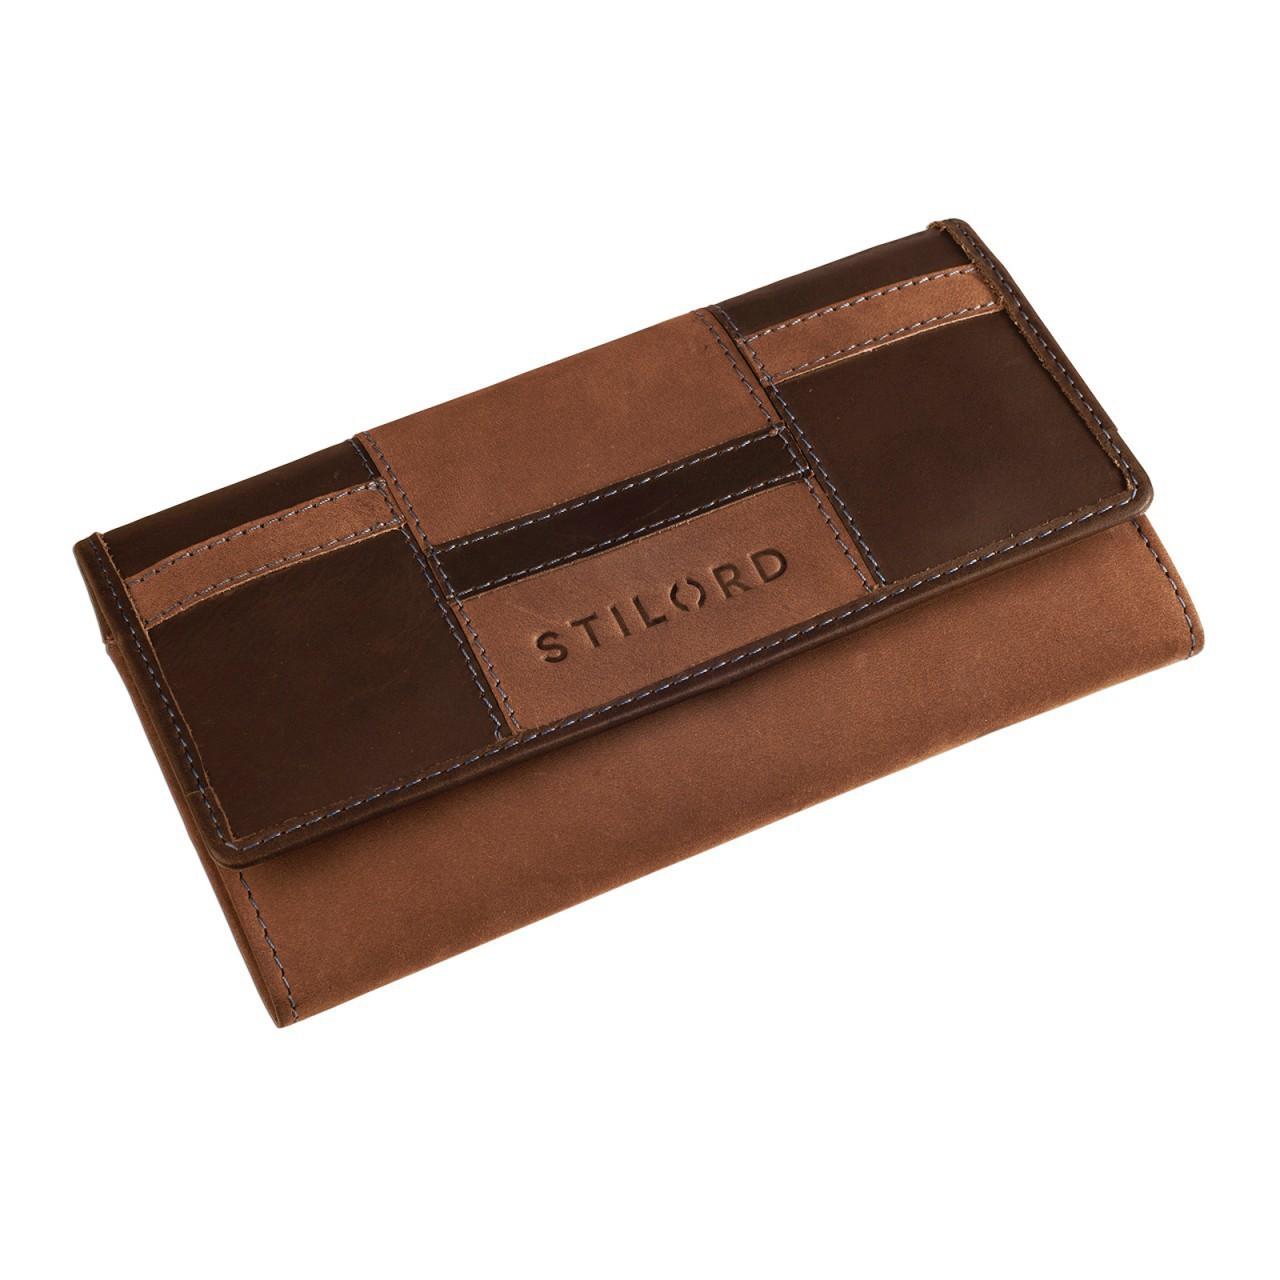 STILORD Leder Portemonnaie Quer mit Reißverschluss Leder Geldbeutel Etui Kellnerbörse Wallet 12 Kartenfächer Büffel-Leder braun - Bild 2